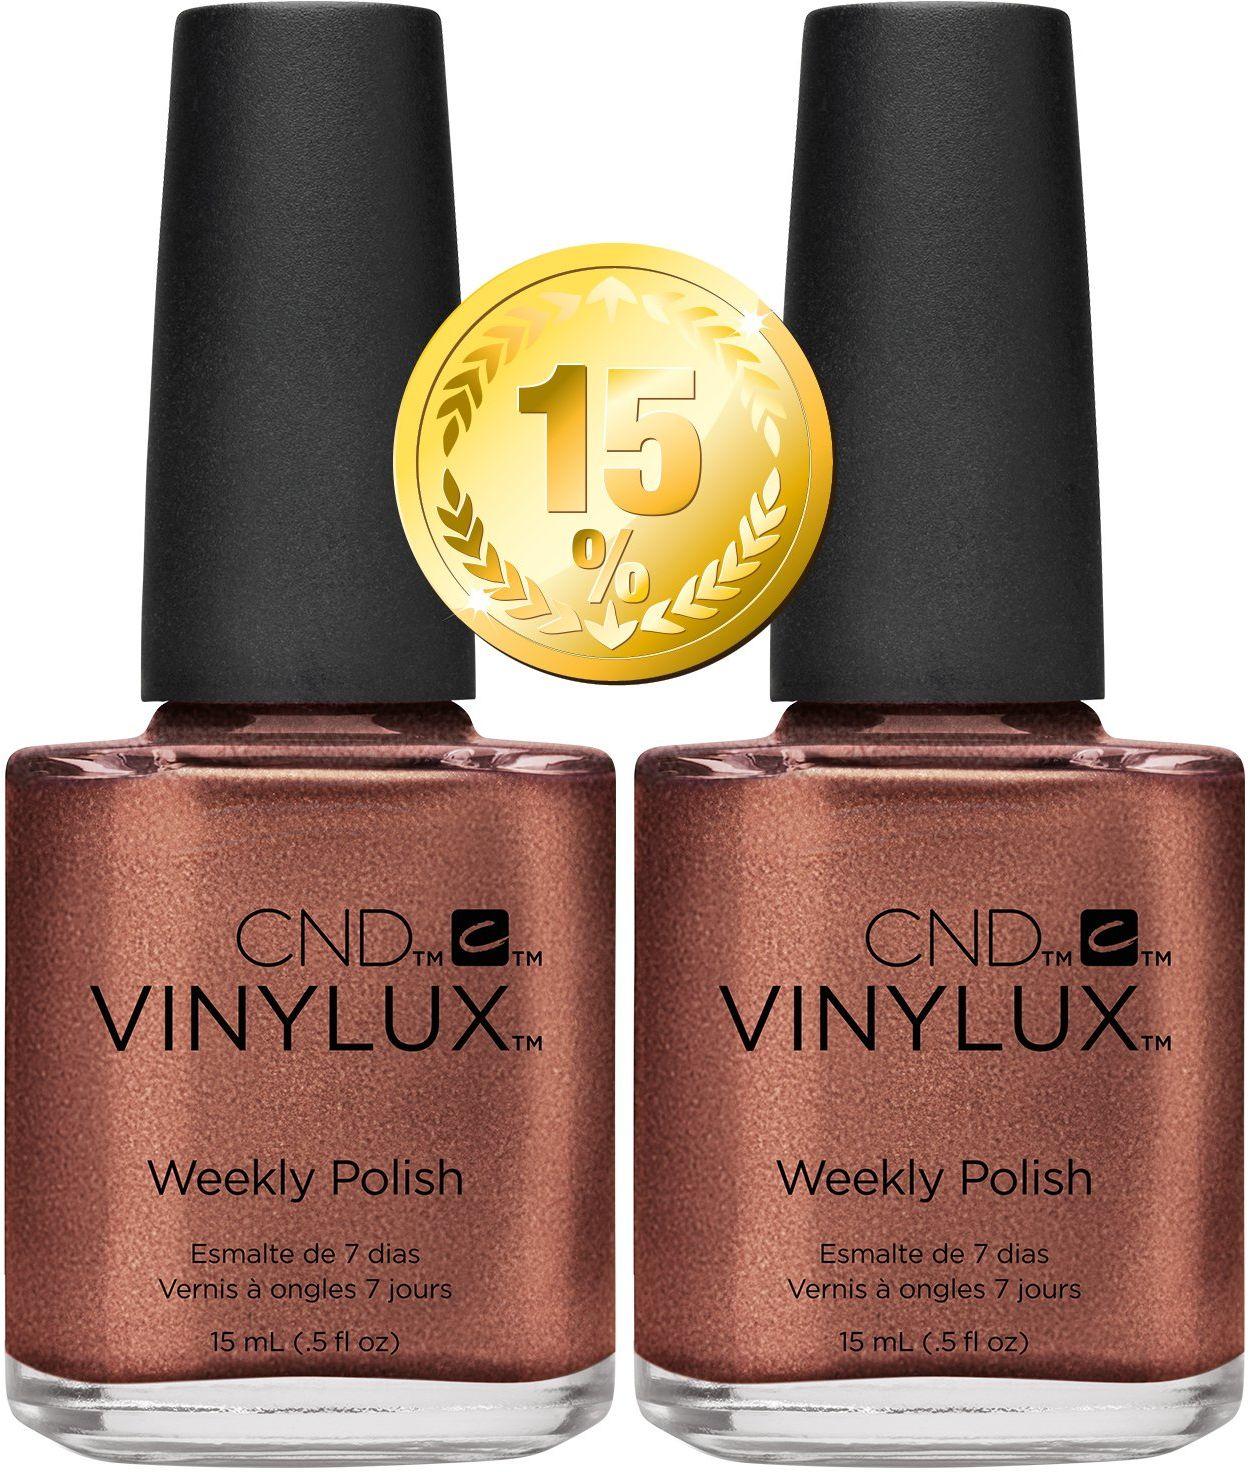 CND Vinylux Sachel # 225 15 ml Pack of 2 - Craft Culture Collection Autumn 2016, 50 g